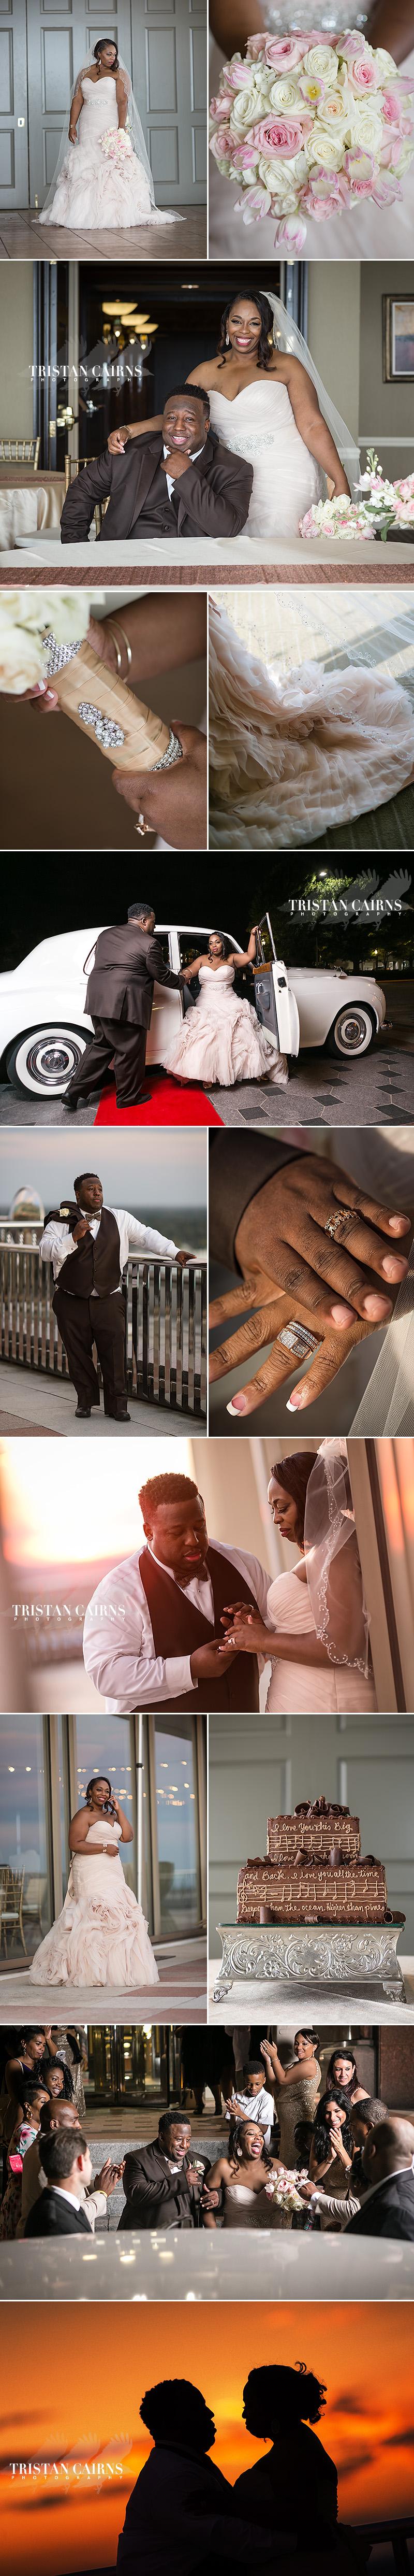 montgomery-wedding-photography